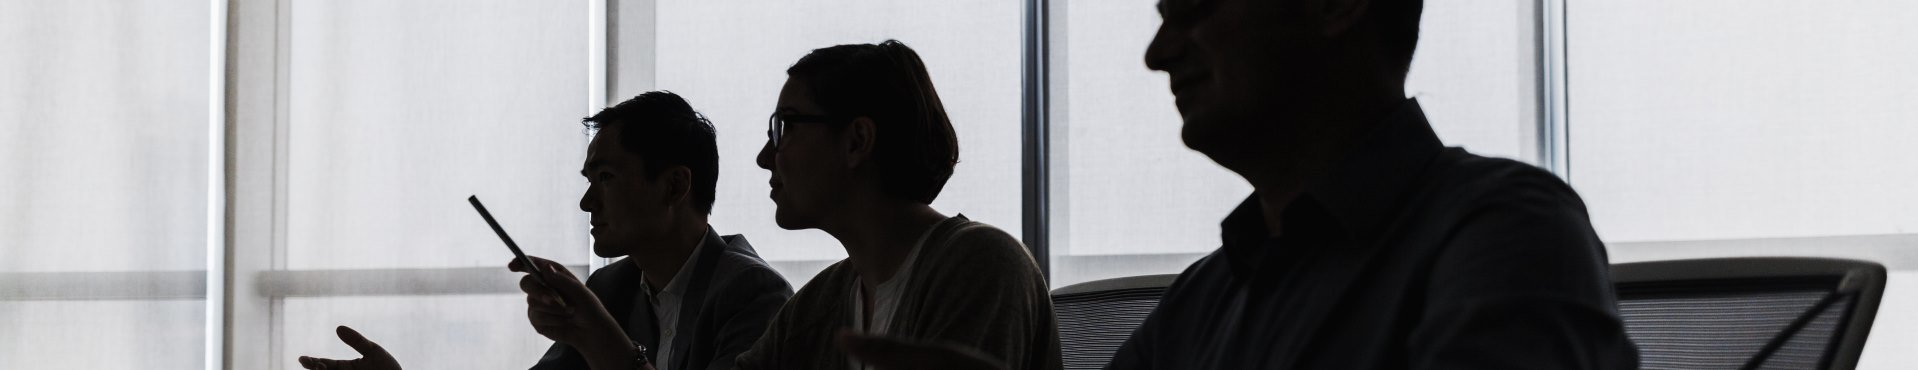 Meeting silhouette | Shine Lawyers